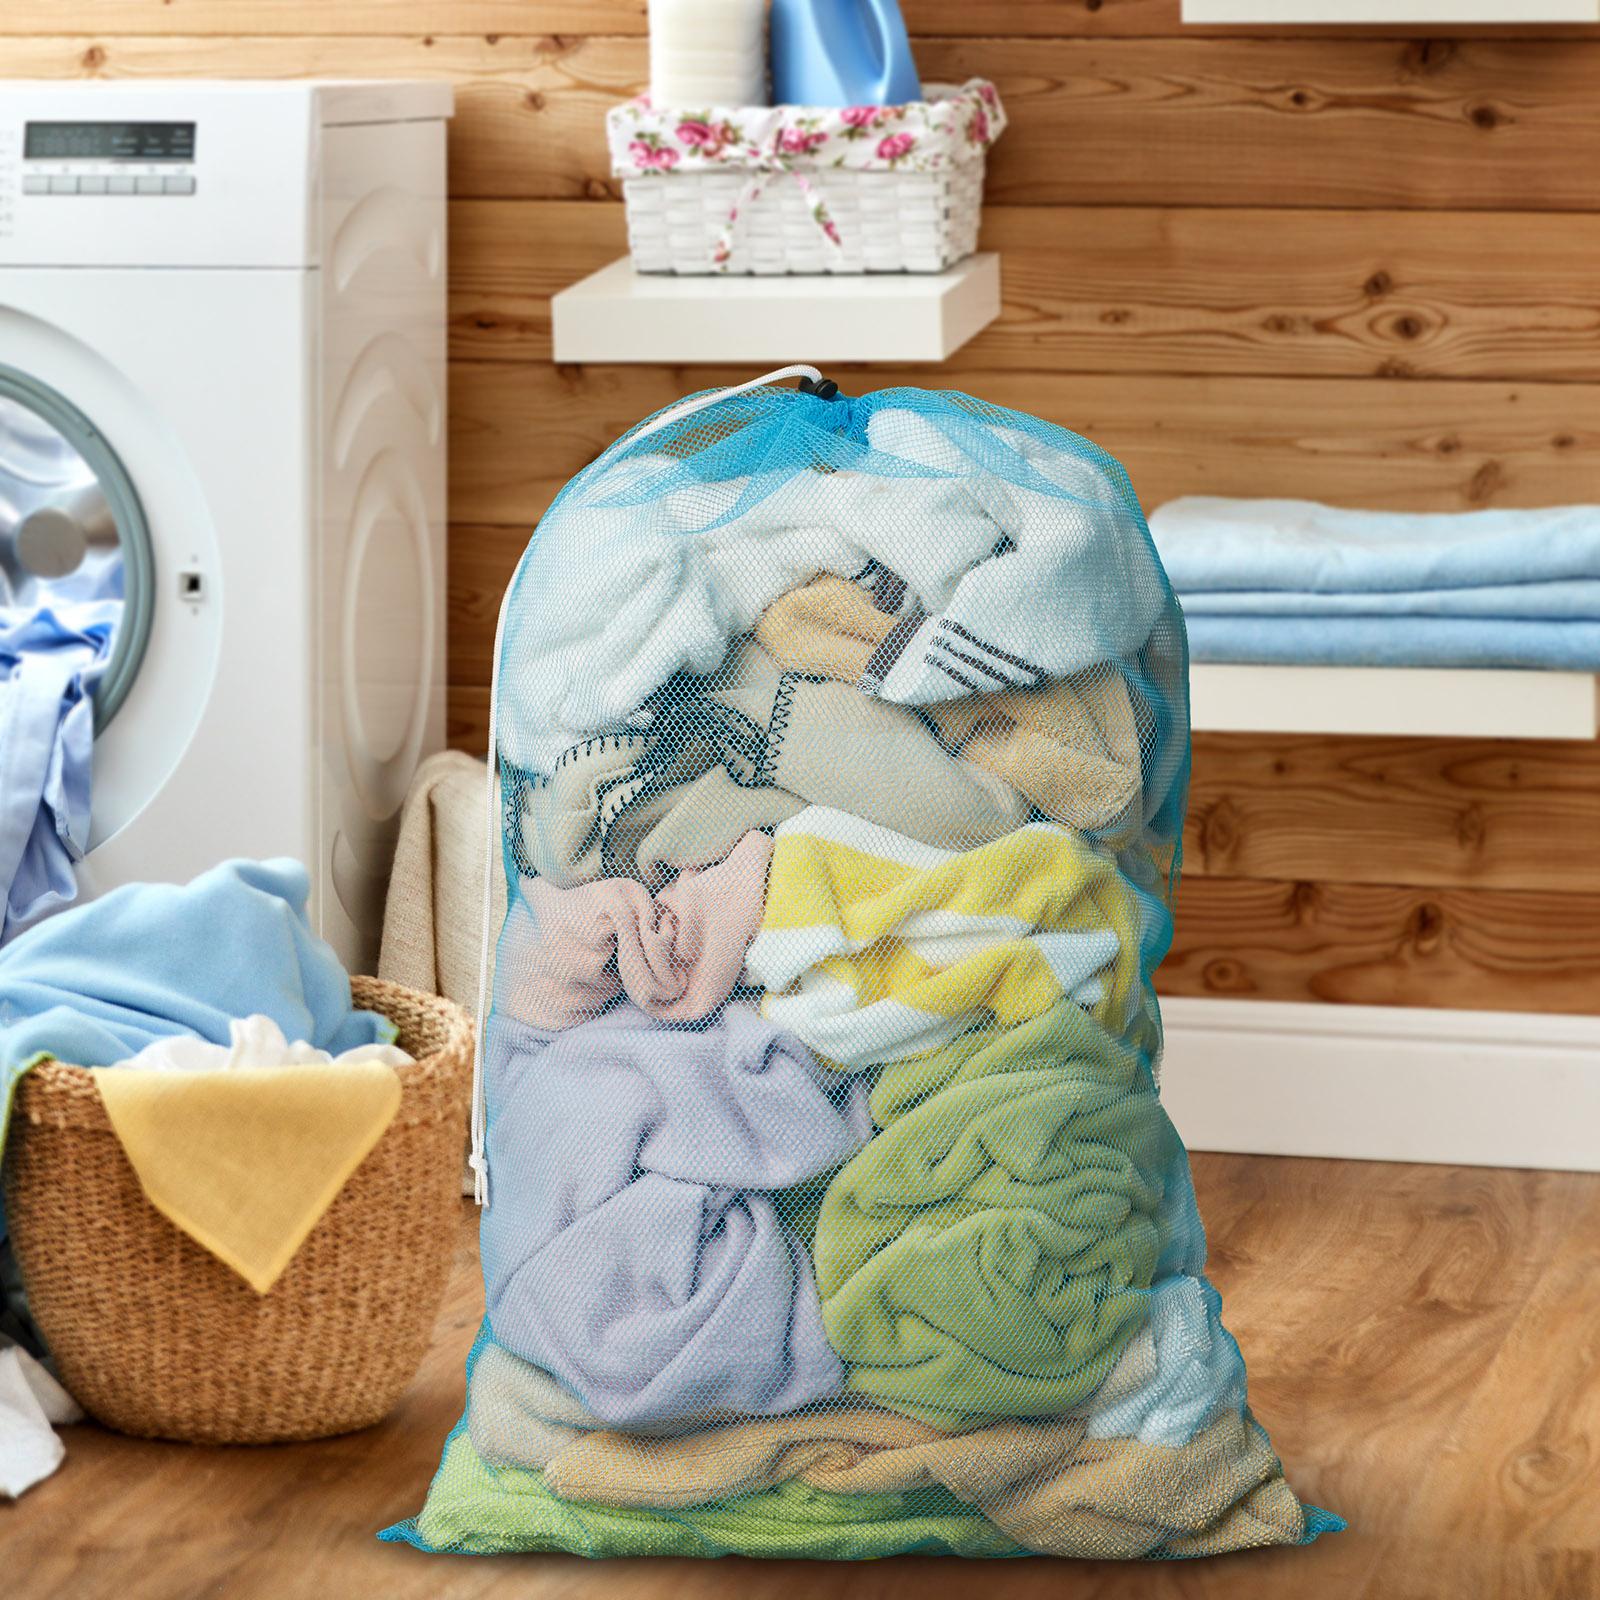 24-034-x-36-034-Large-Heavy-Duty-Mesh-Net-Drawstring-Laundry-or-Equipment-Ball-Bag thumbnail 19